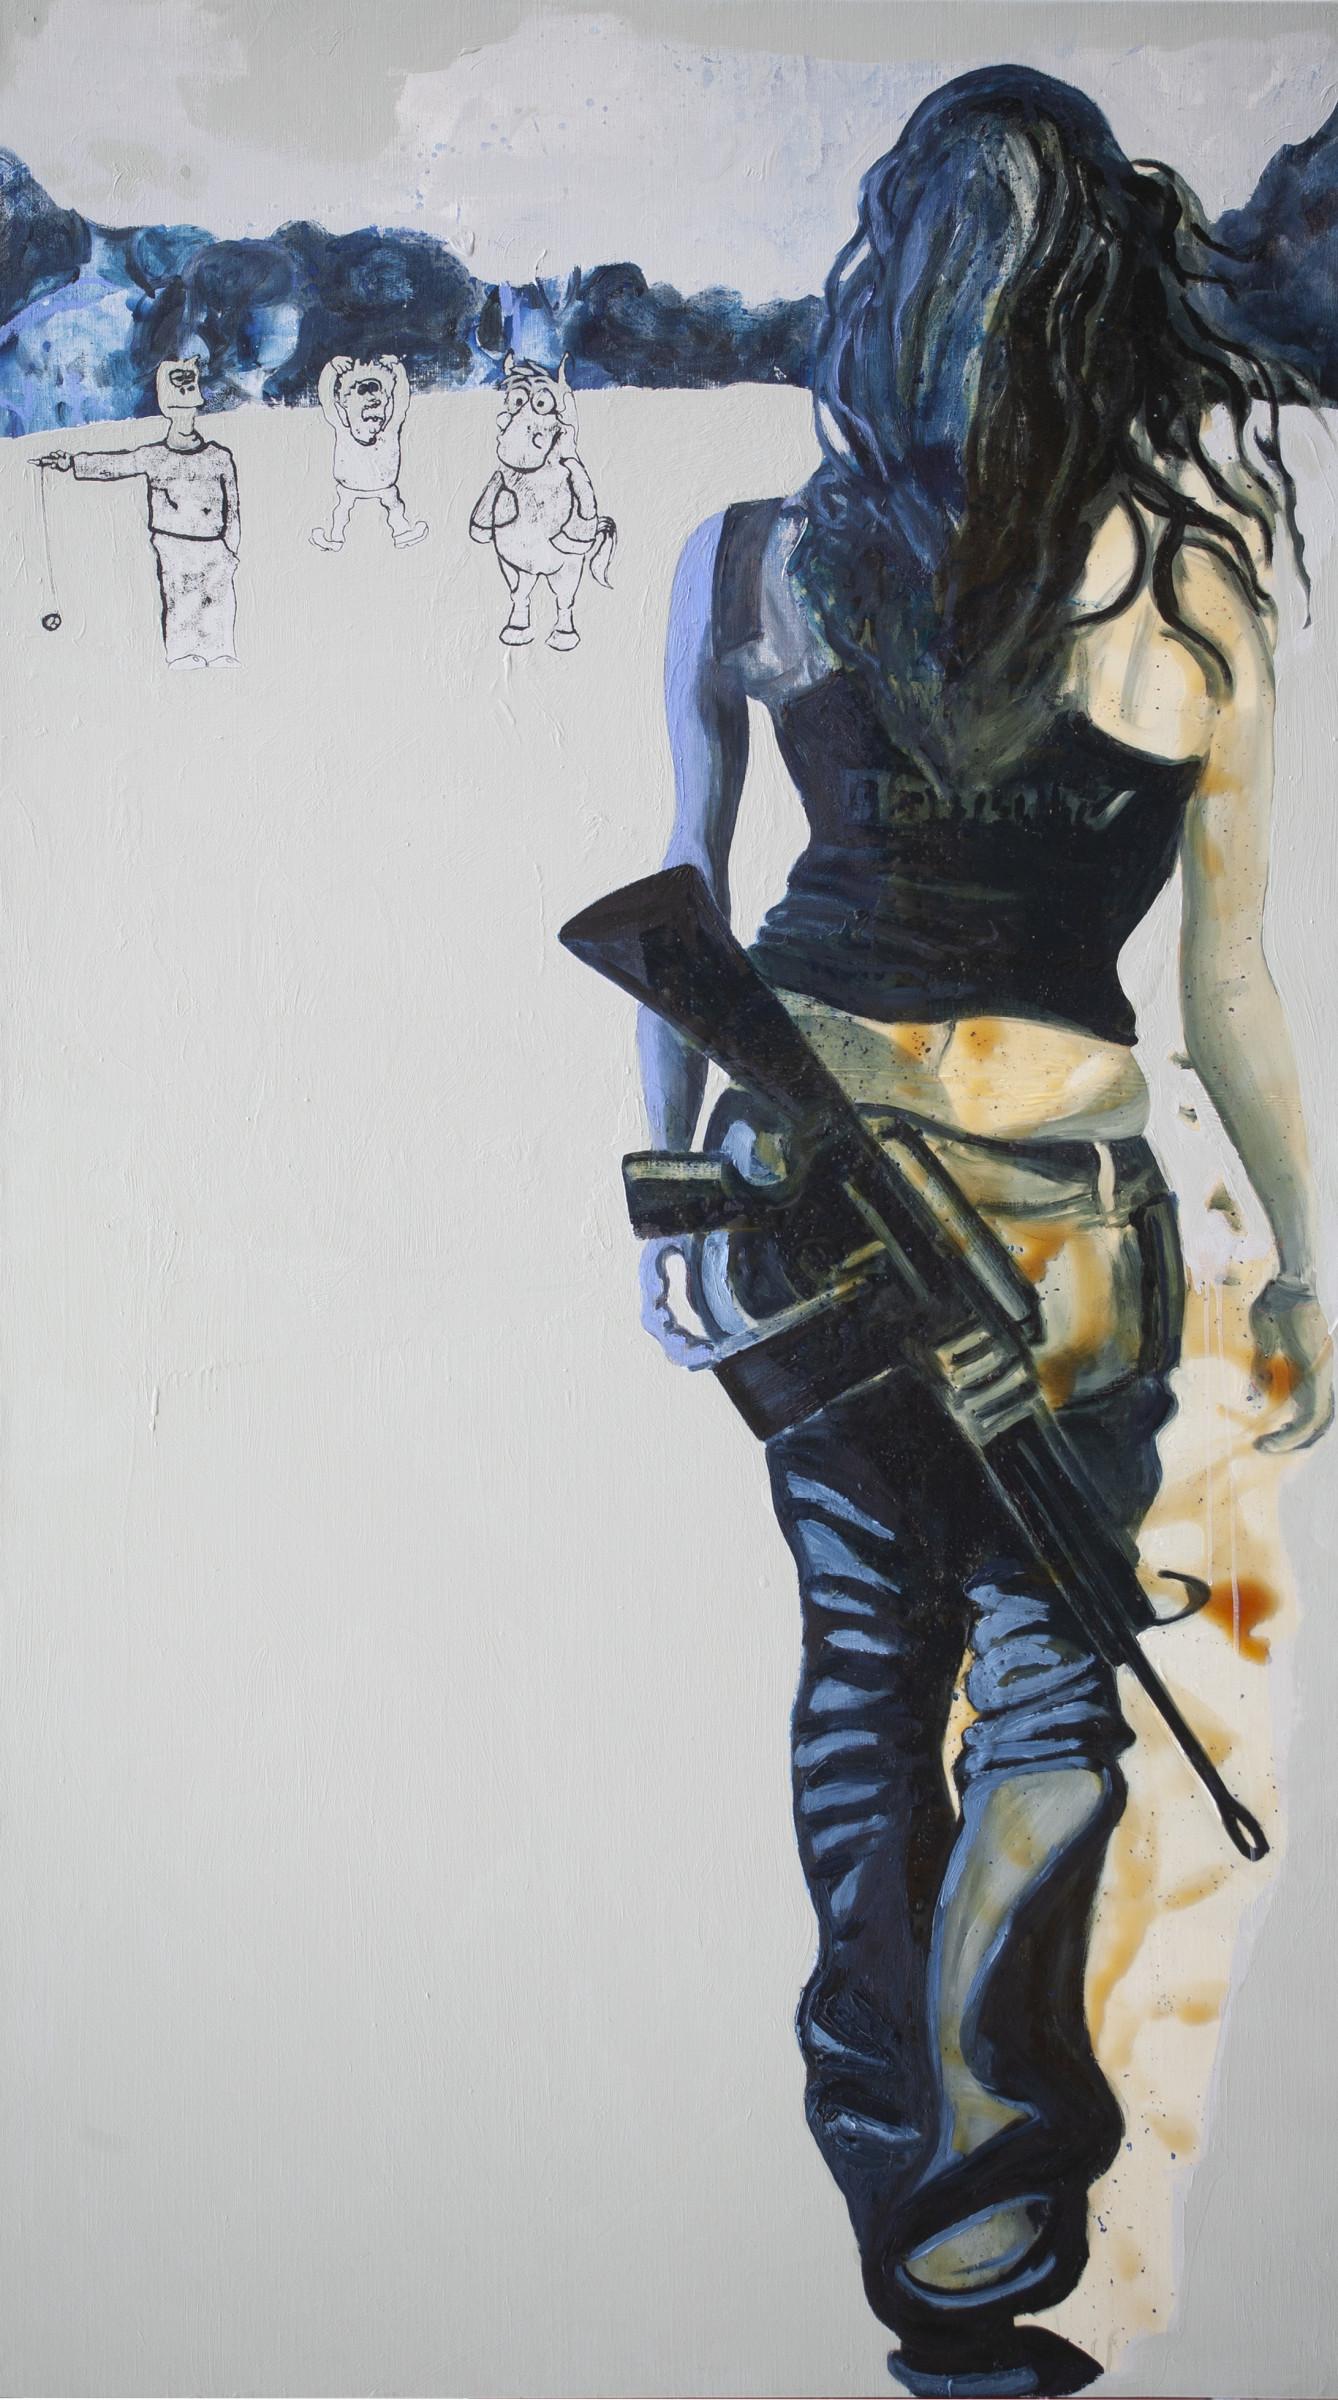 <span class=&#34;link fancybox-details-link&#34;><a href=&#34;/artists/26-rob-visje/works/4934-rob-visje-woman-with-gun-special/&#34;>View Detail Page</a></span><div class=&#34;artist&#34;><strong>Rob Visje</strong></div> <div class=&#34;title&#34;><em>Woman with gun special </em></div> <div class=&#34;medium&#34;>Mixed Media</div> <div class=&#34;dimensions&#34;>200 x 110 cm</div>